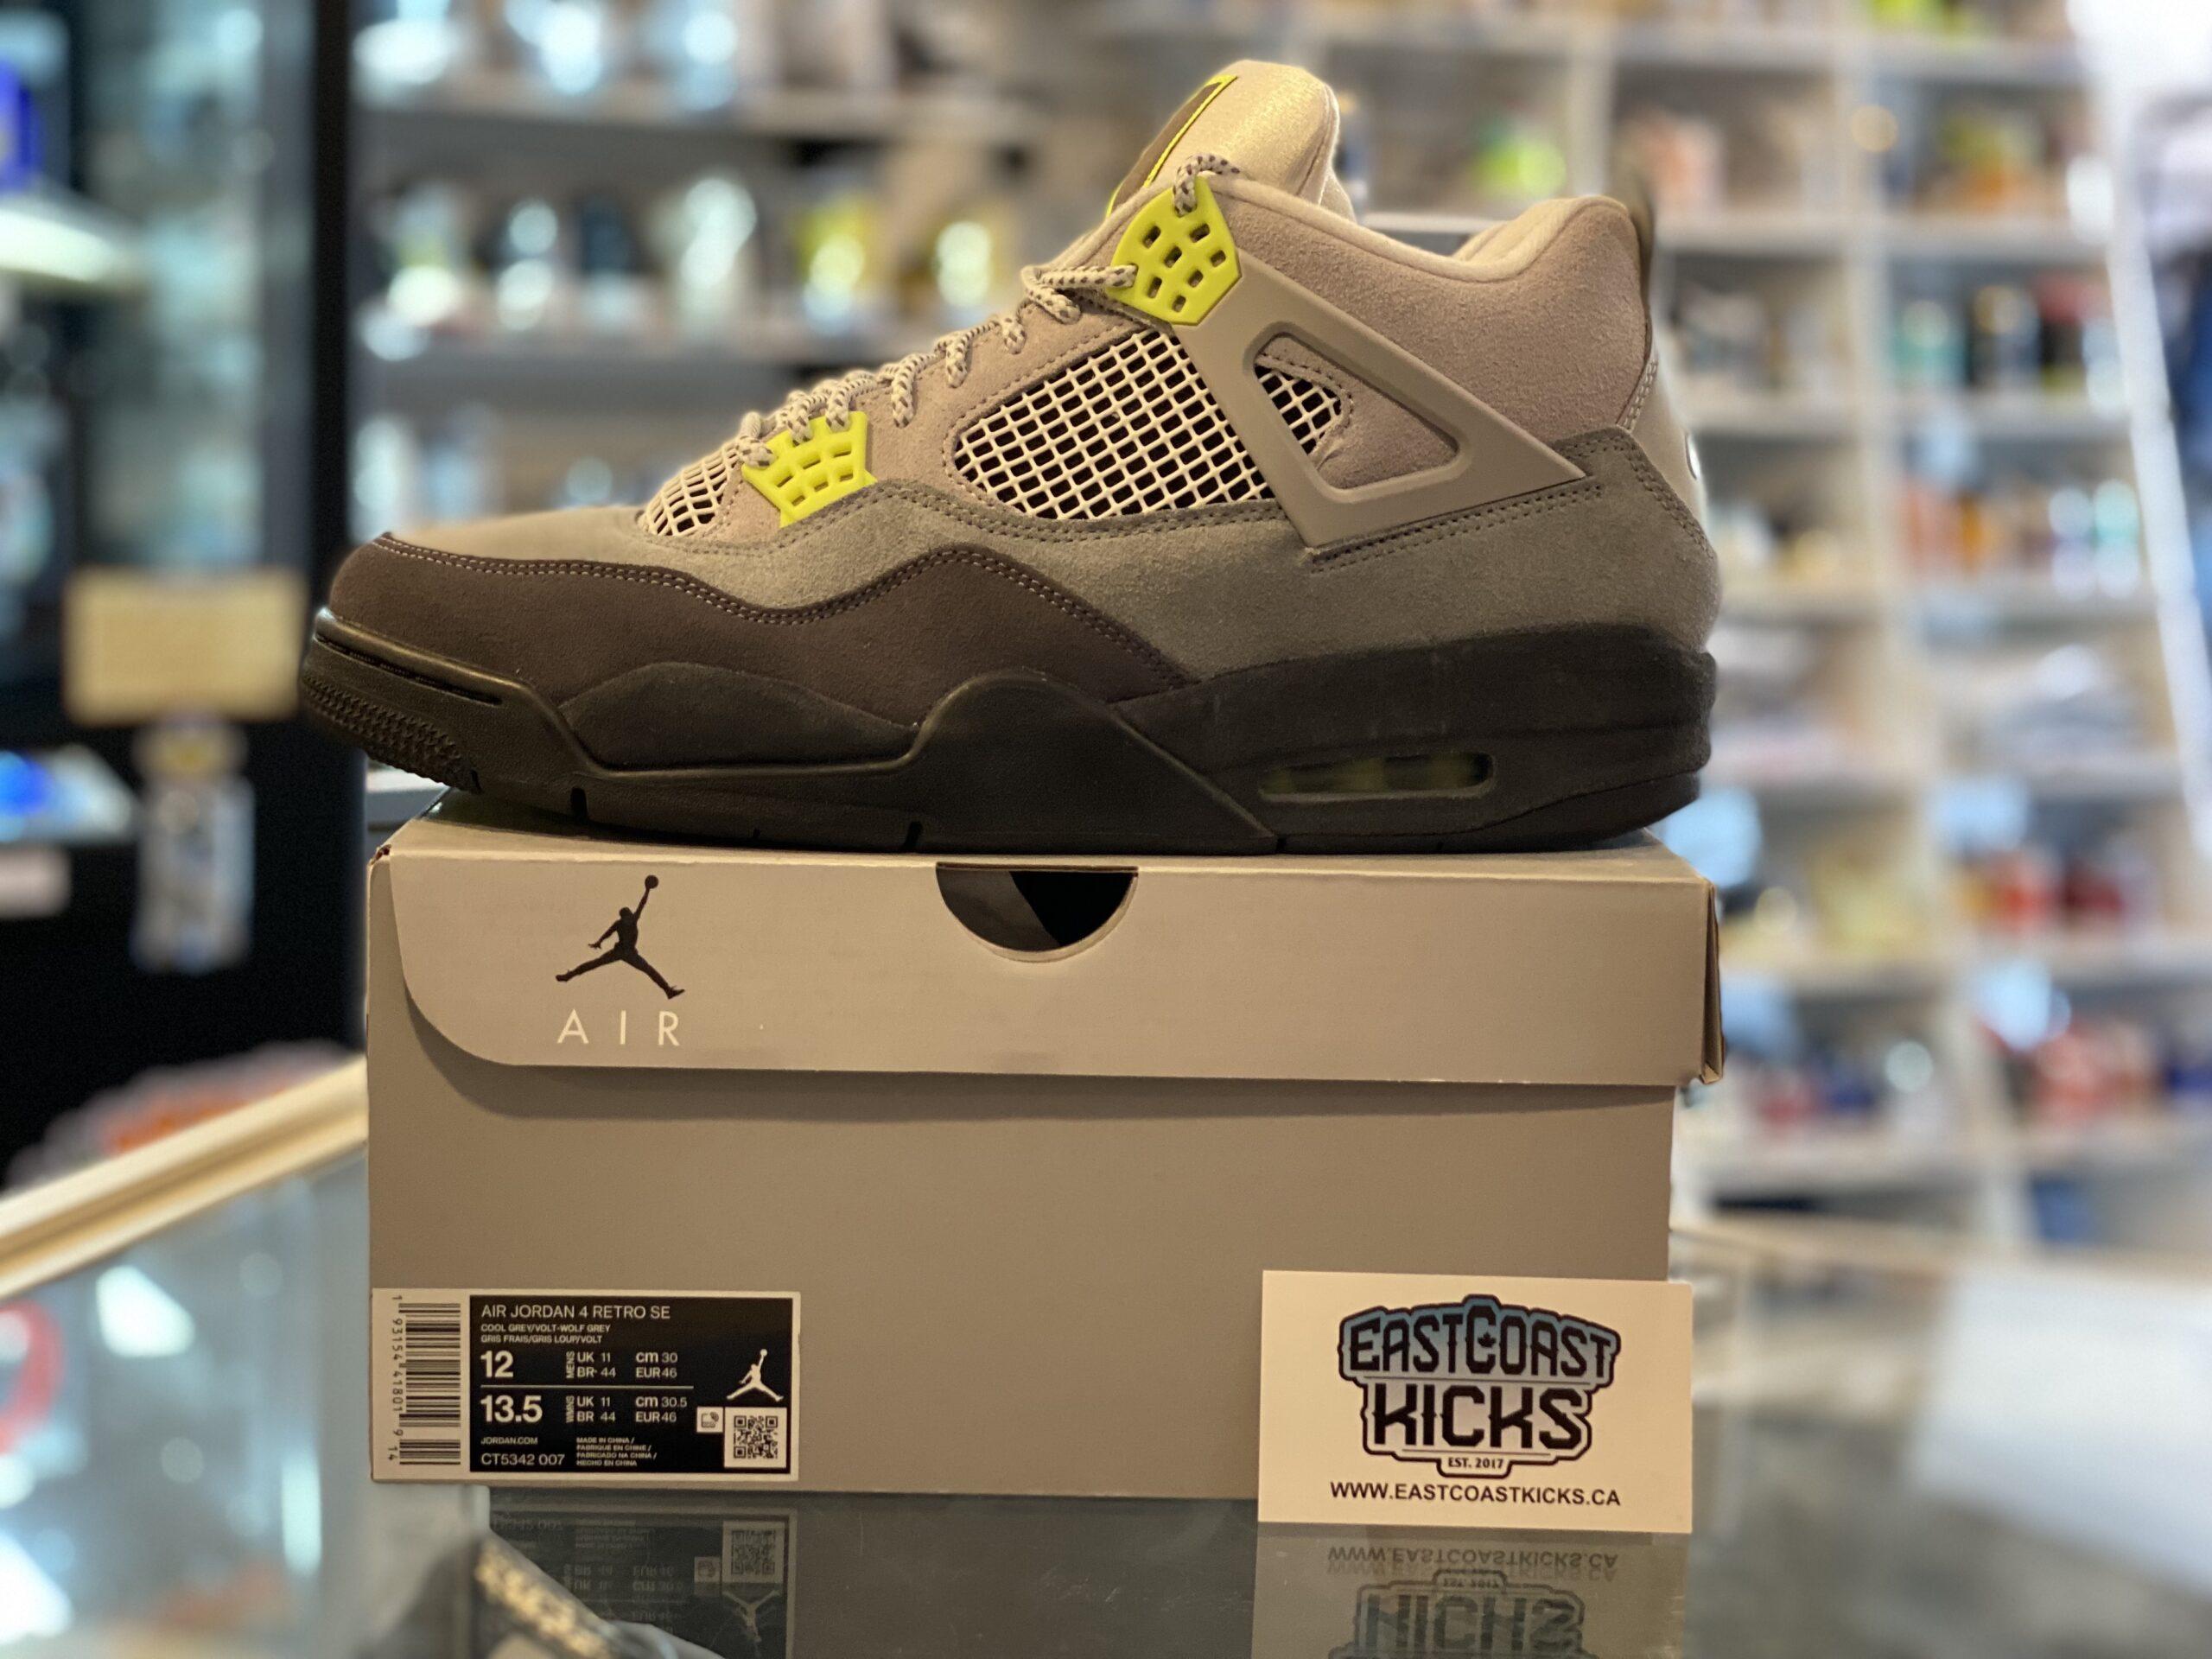 Preowned Jordan 4 Neon 95 Size 12